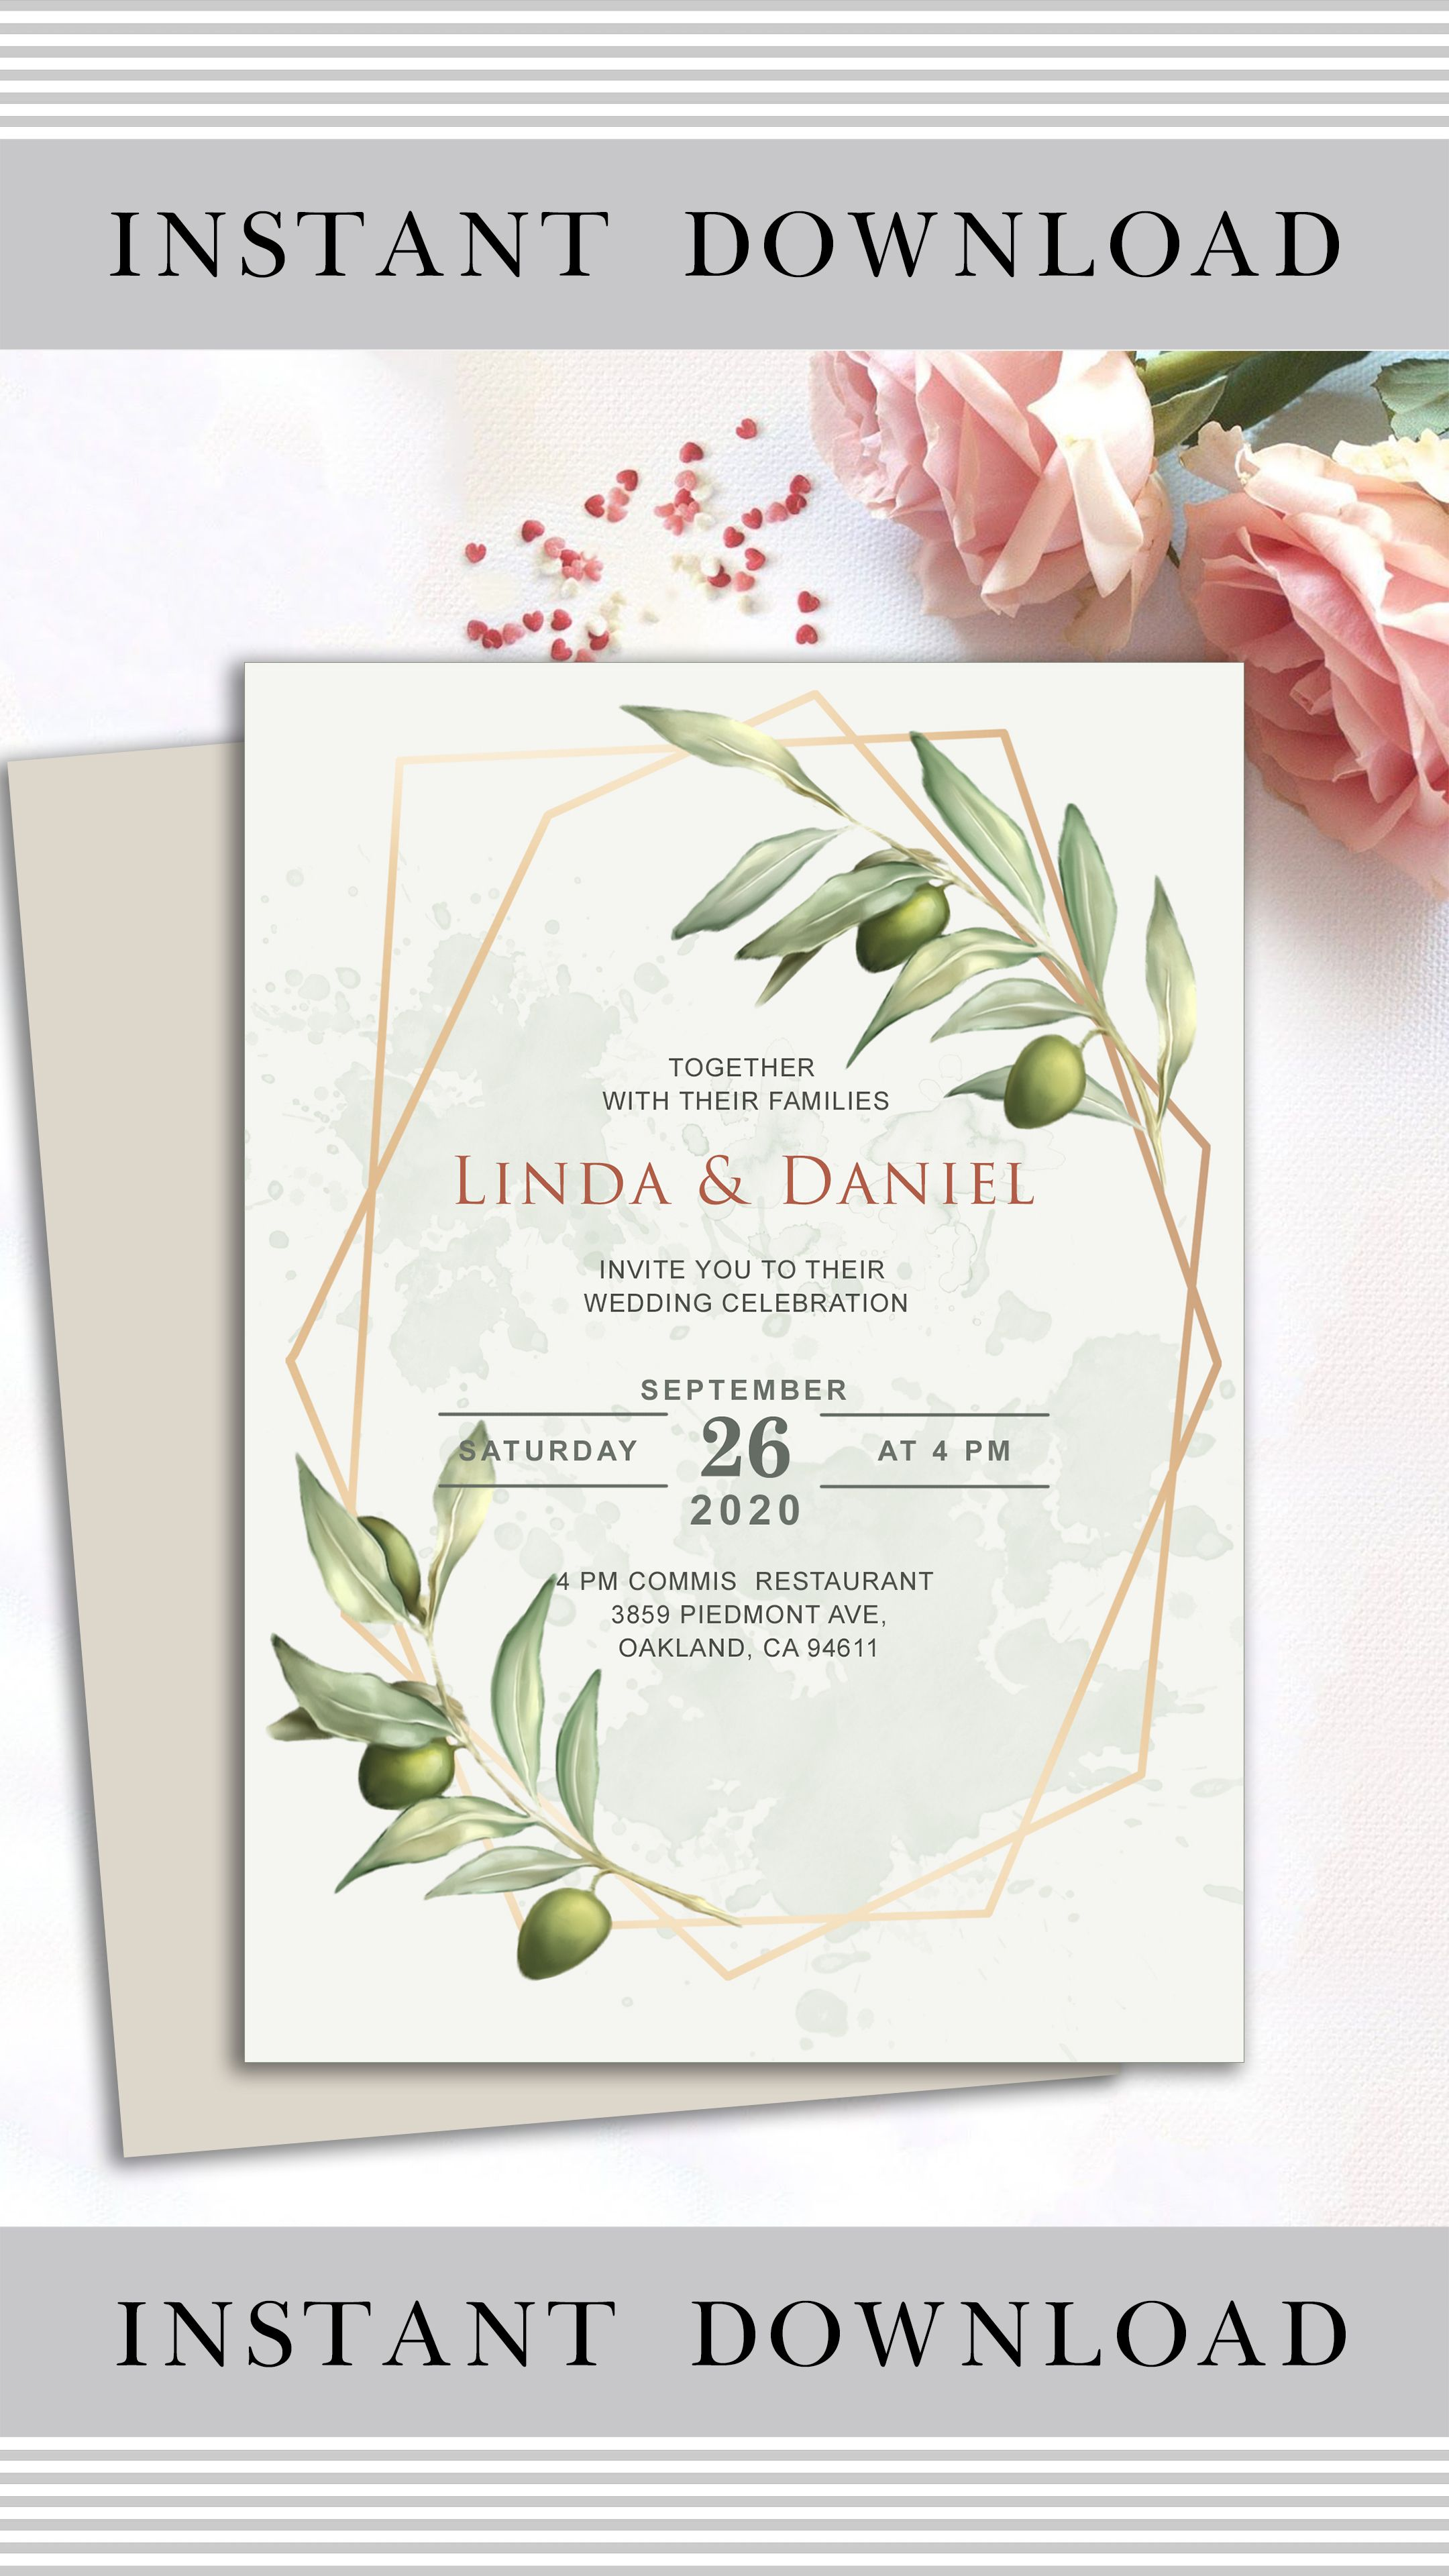 Olive wedding invitation template geometric wedding etsy